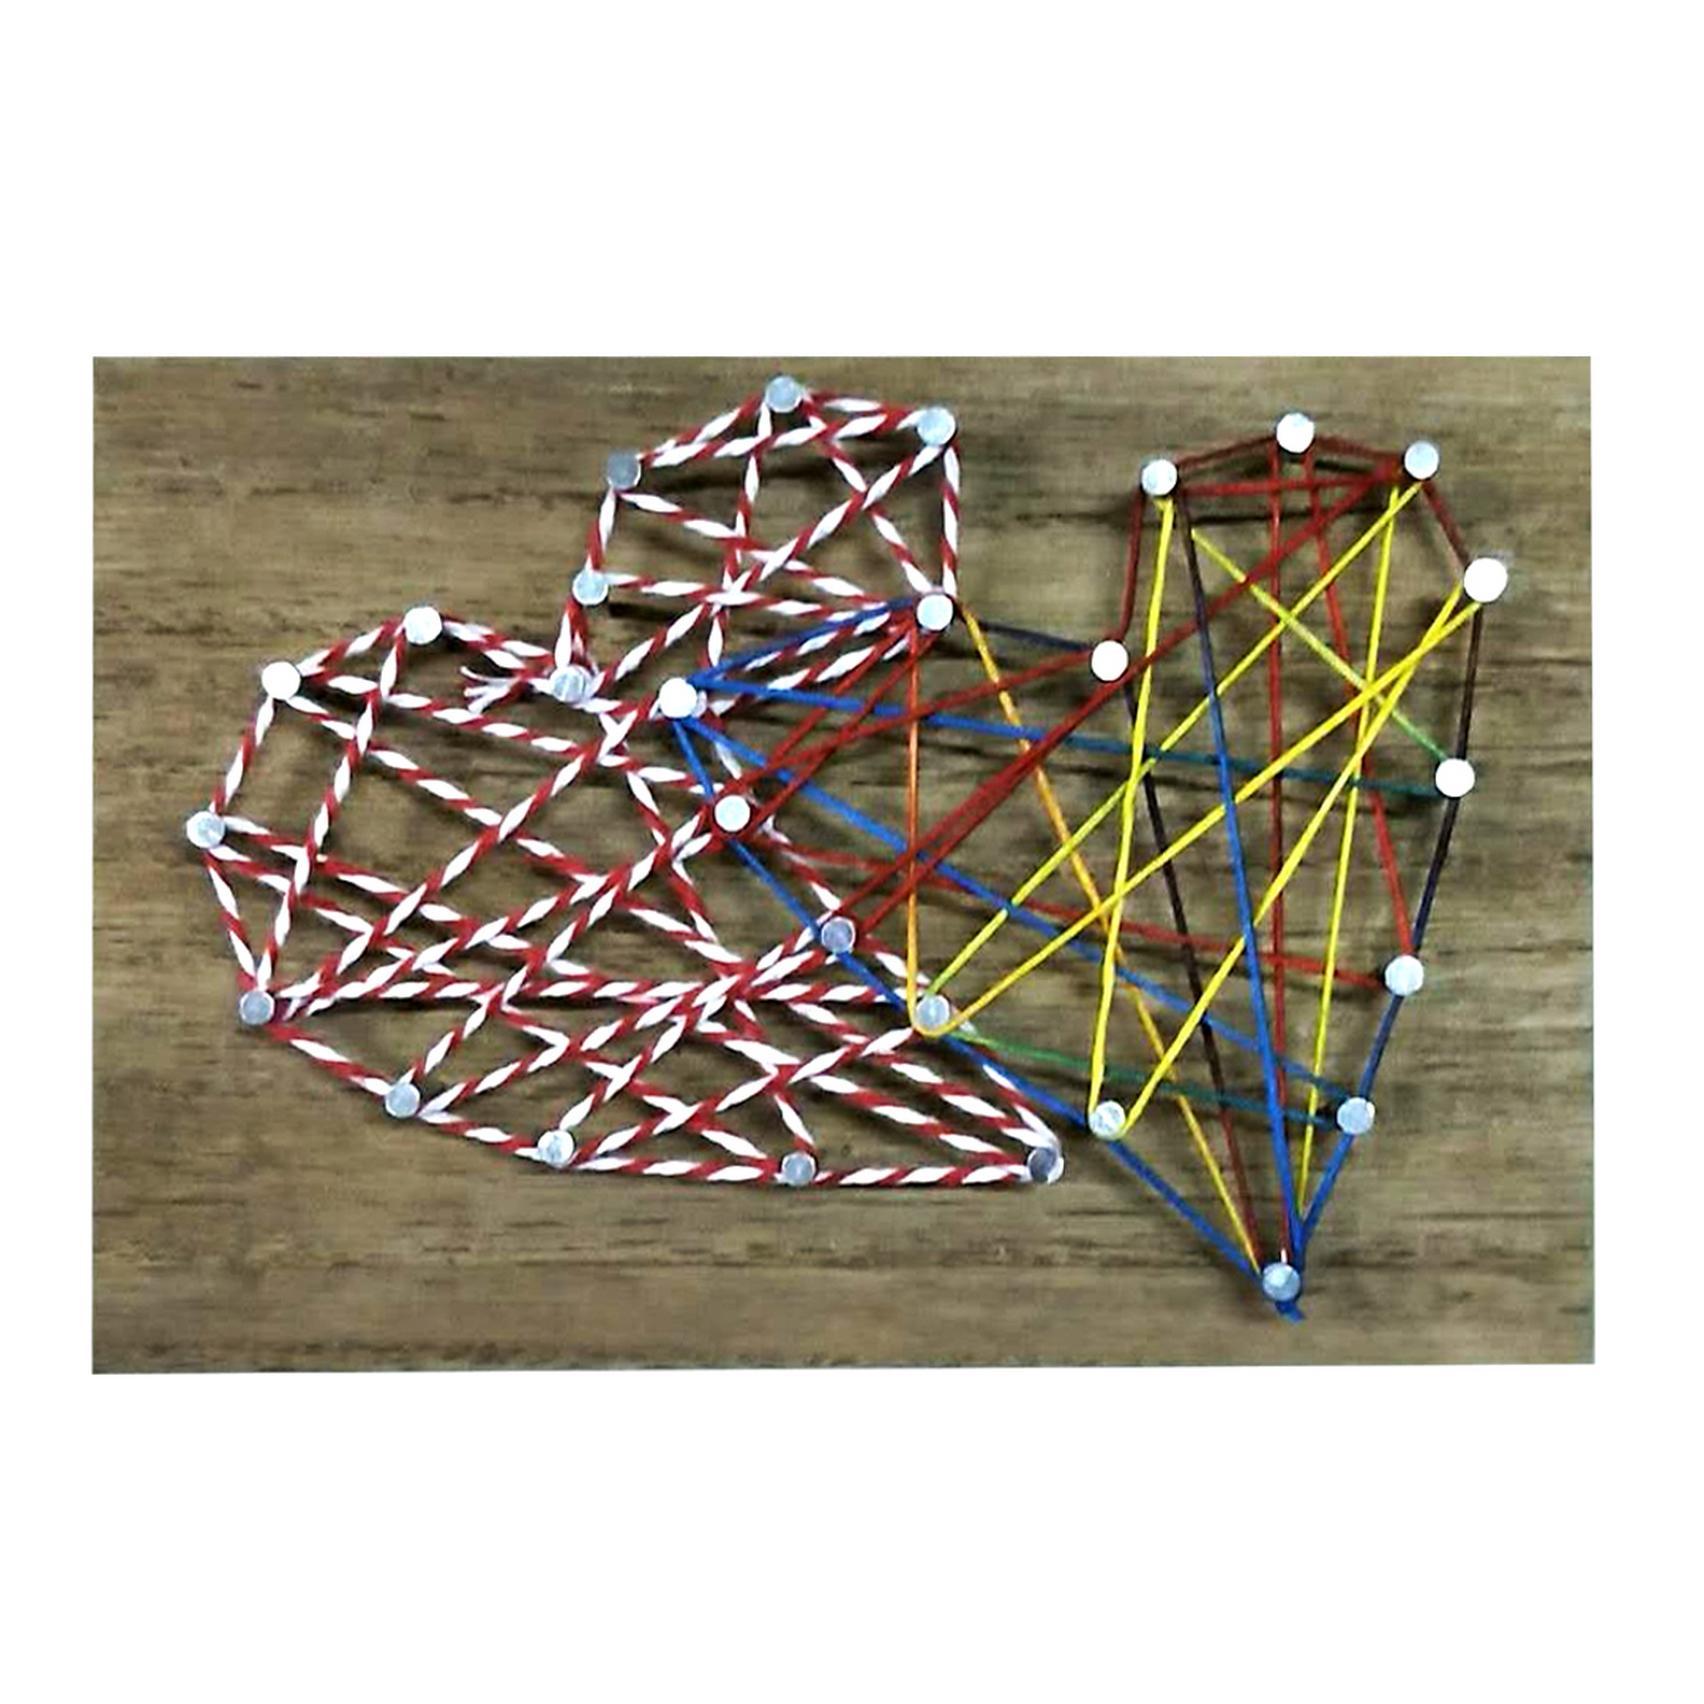 Quadro Madeira String Art Dois Coracoes Colorido 14X0.9X9.5Cm  - Urban